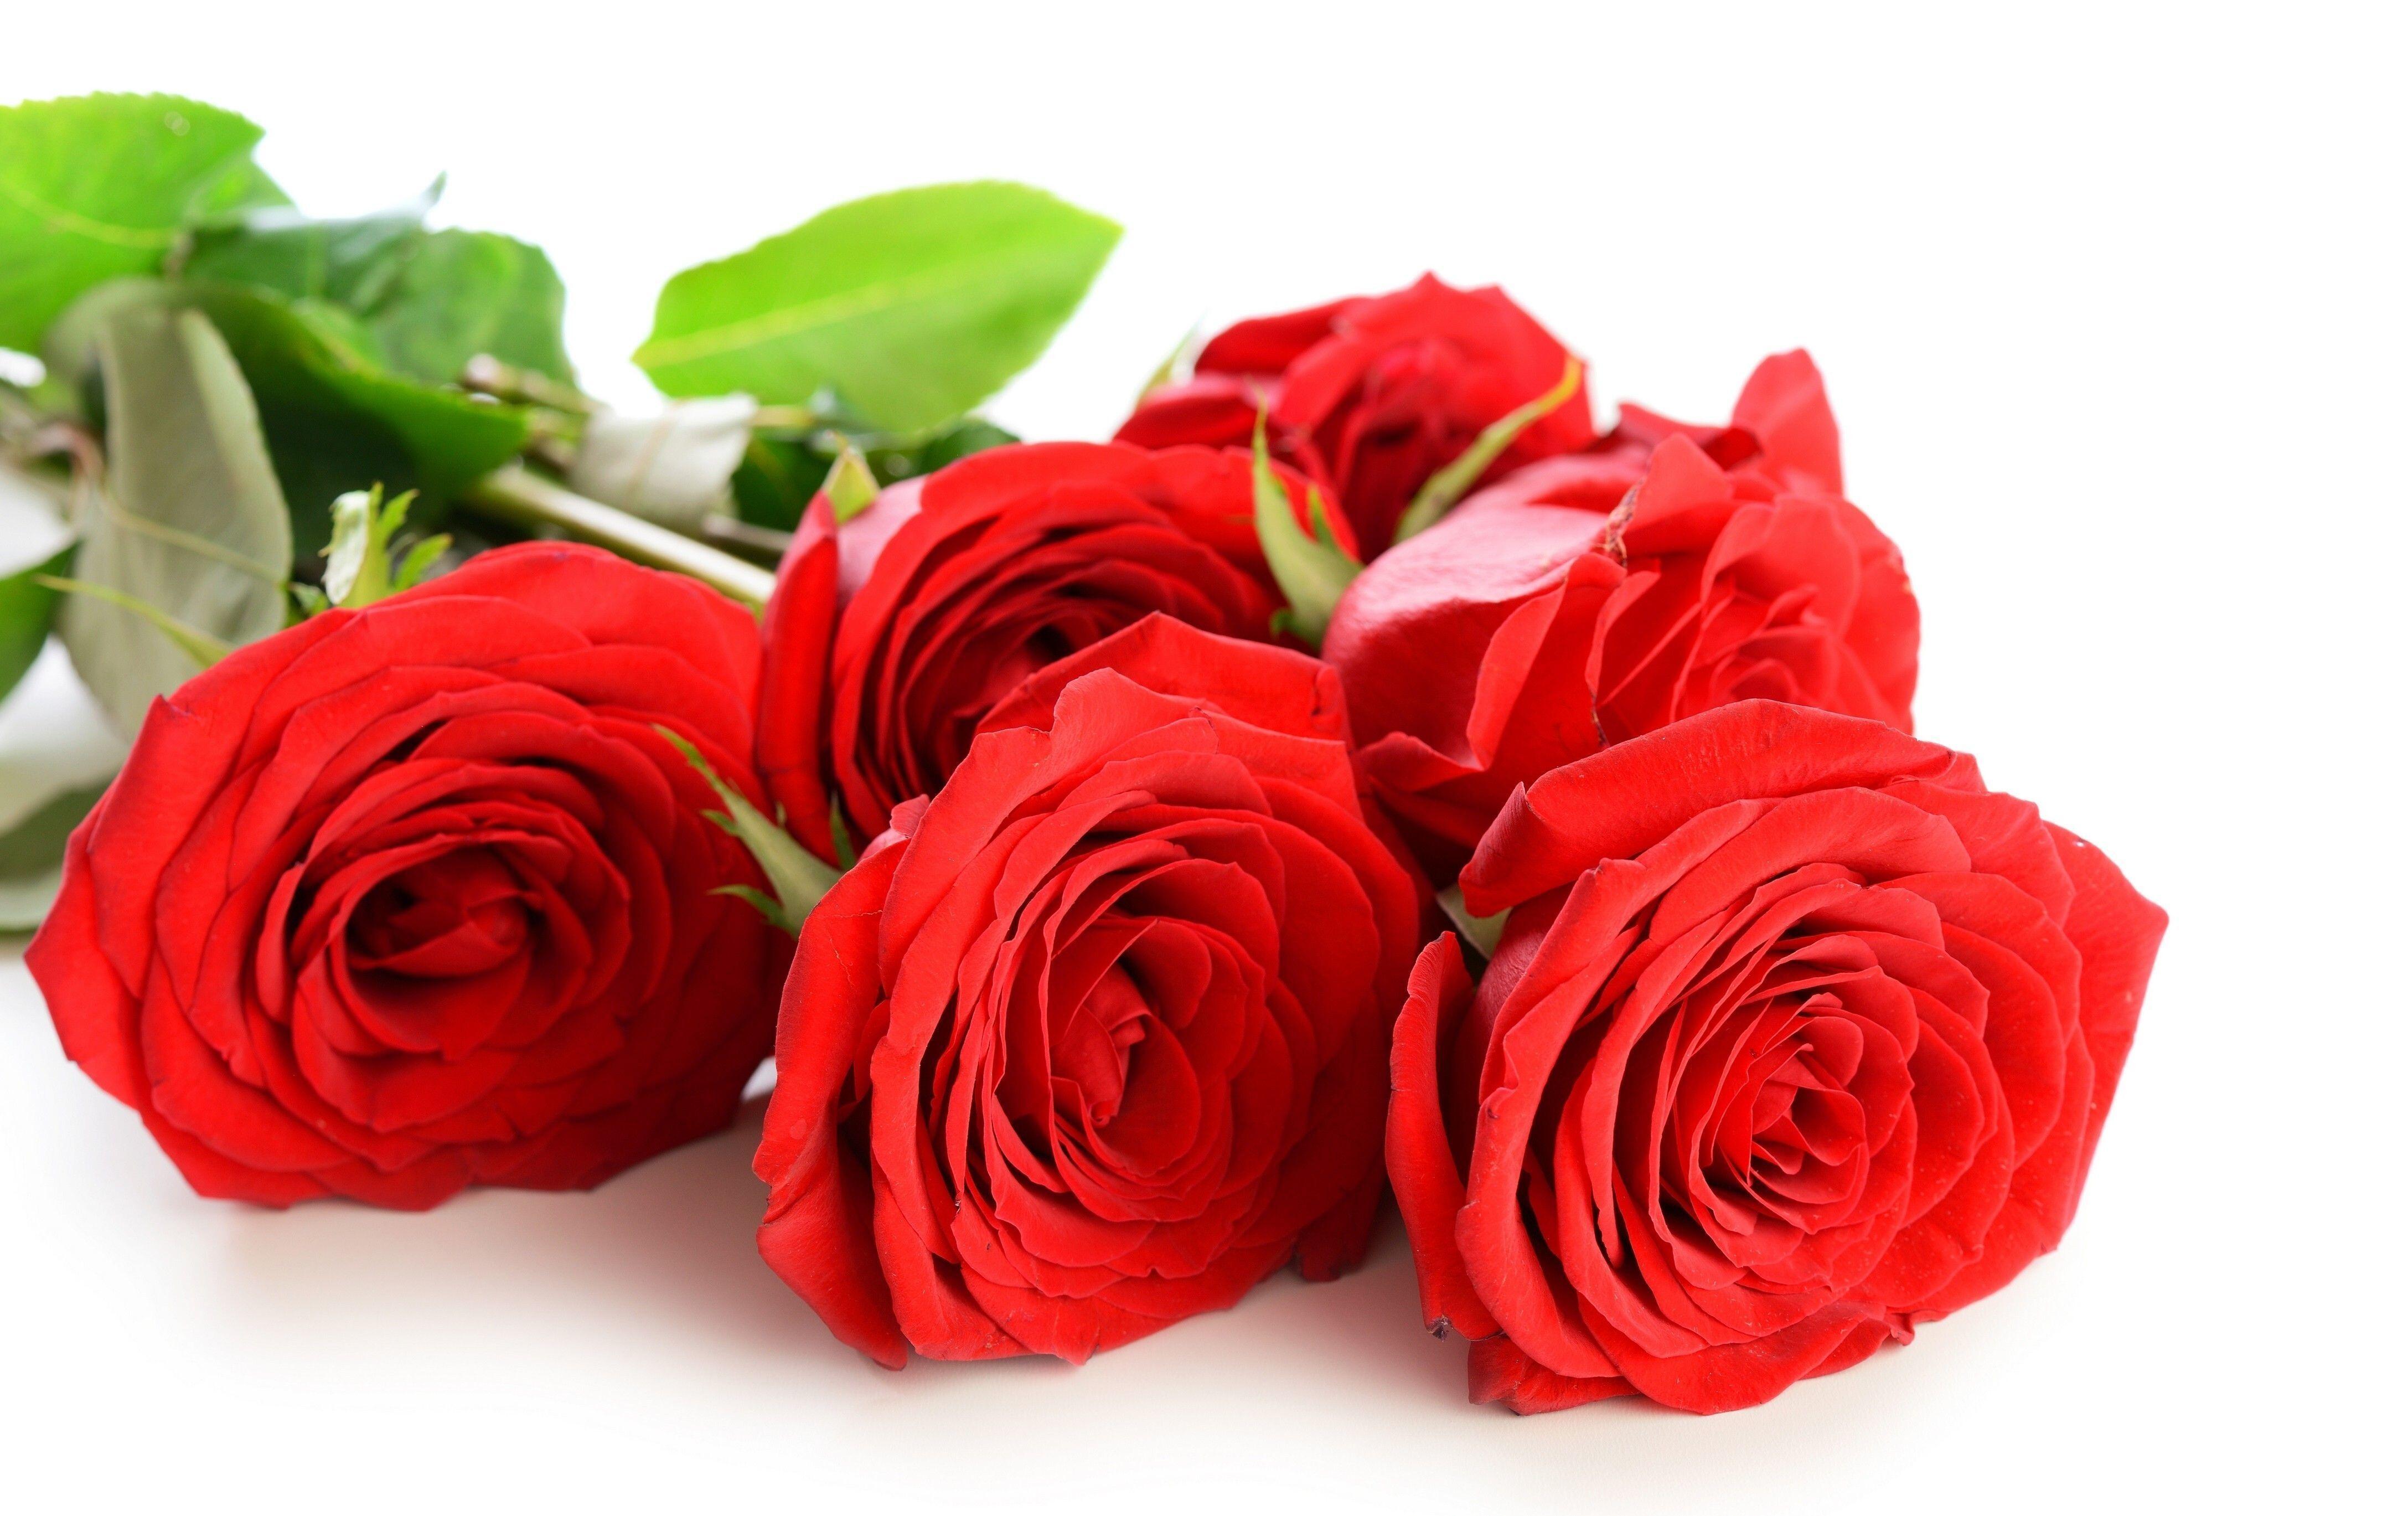 Beautiful Rose Flower 4k Wallpaper Hd Wallpapers